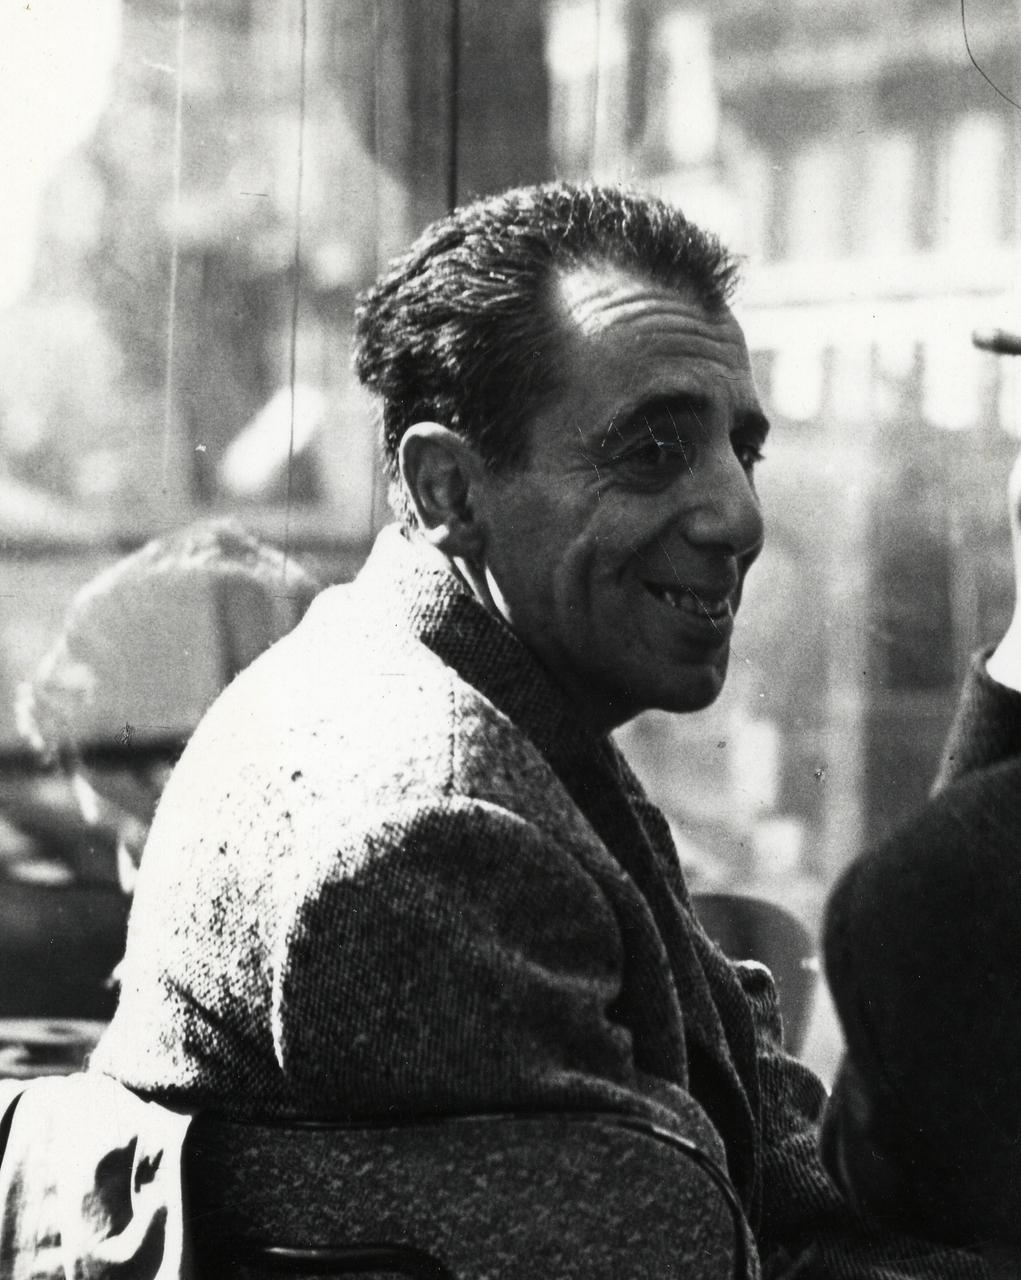 image for Adamov, Arthur (1908-1970)